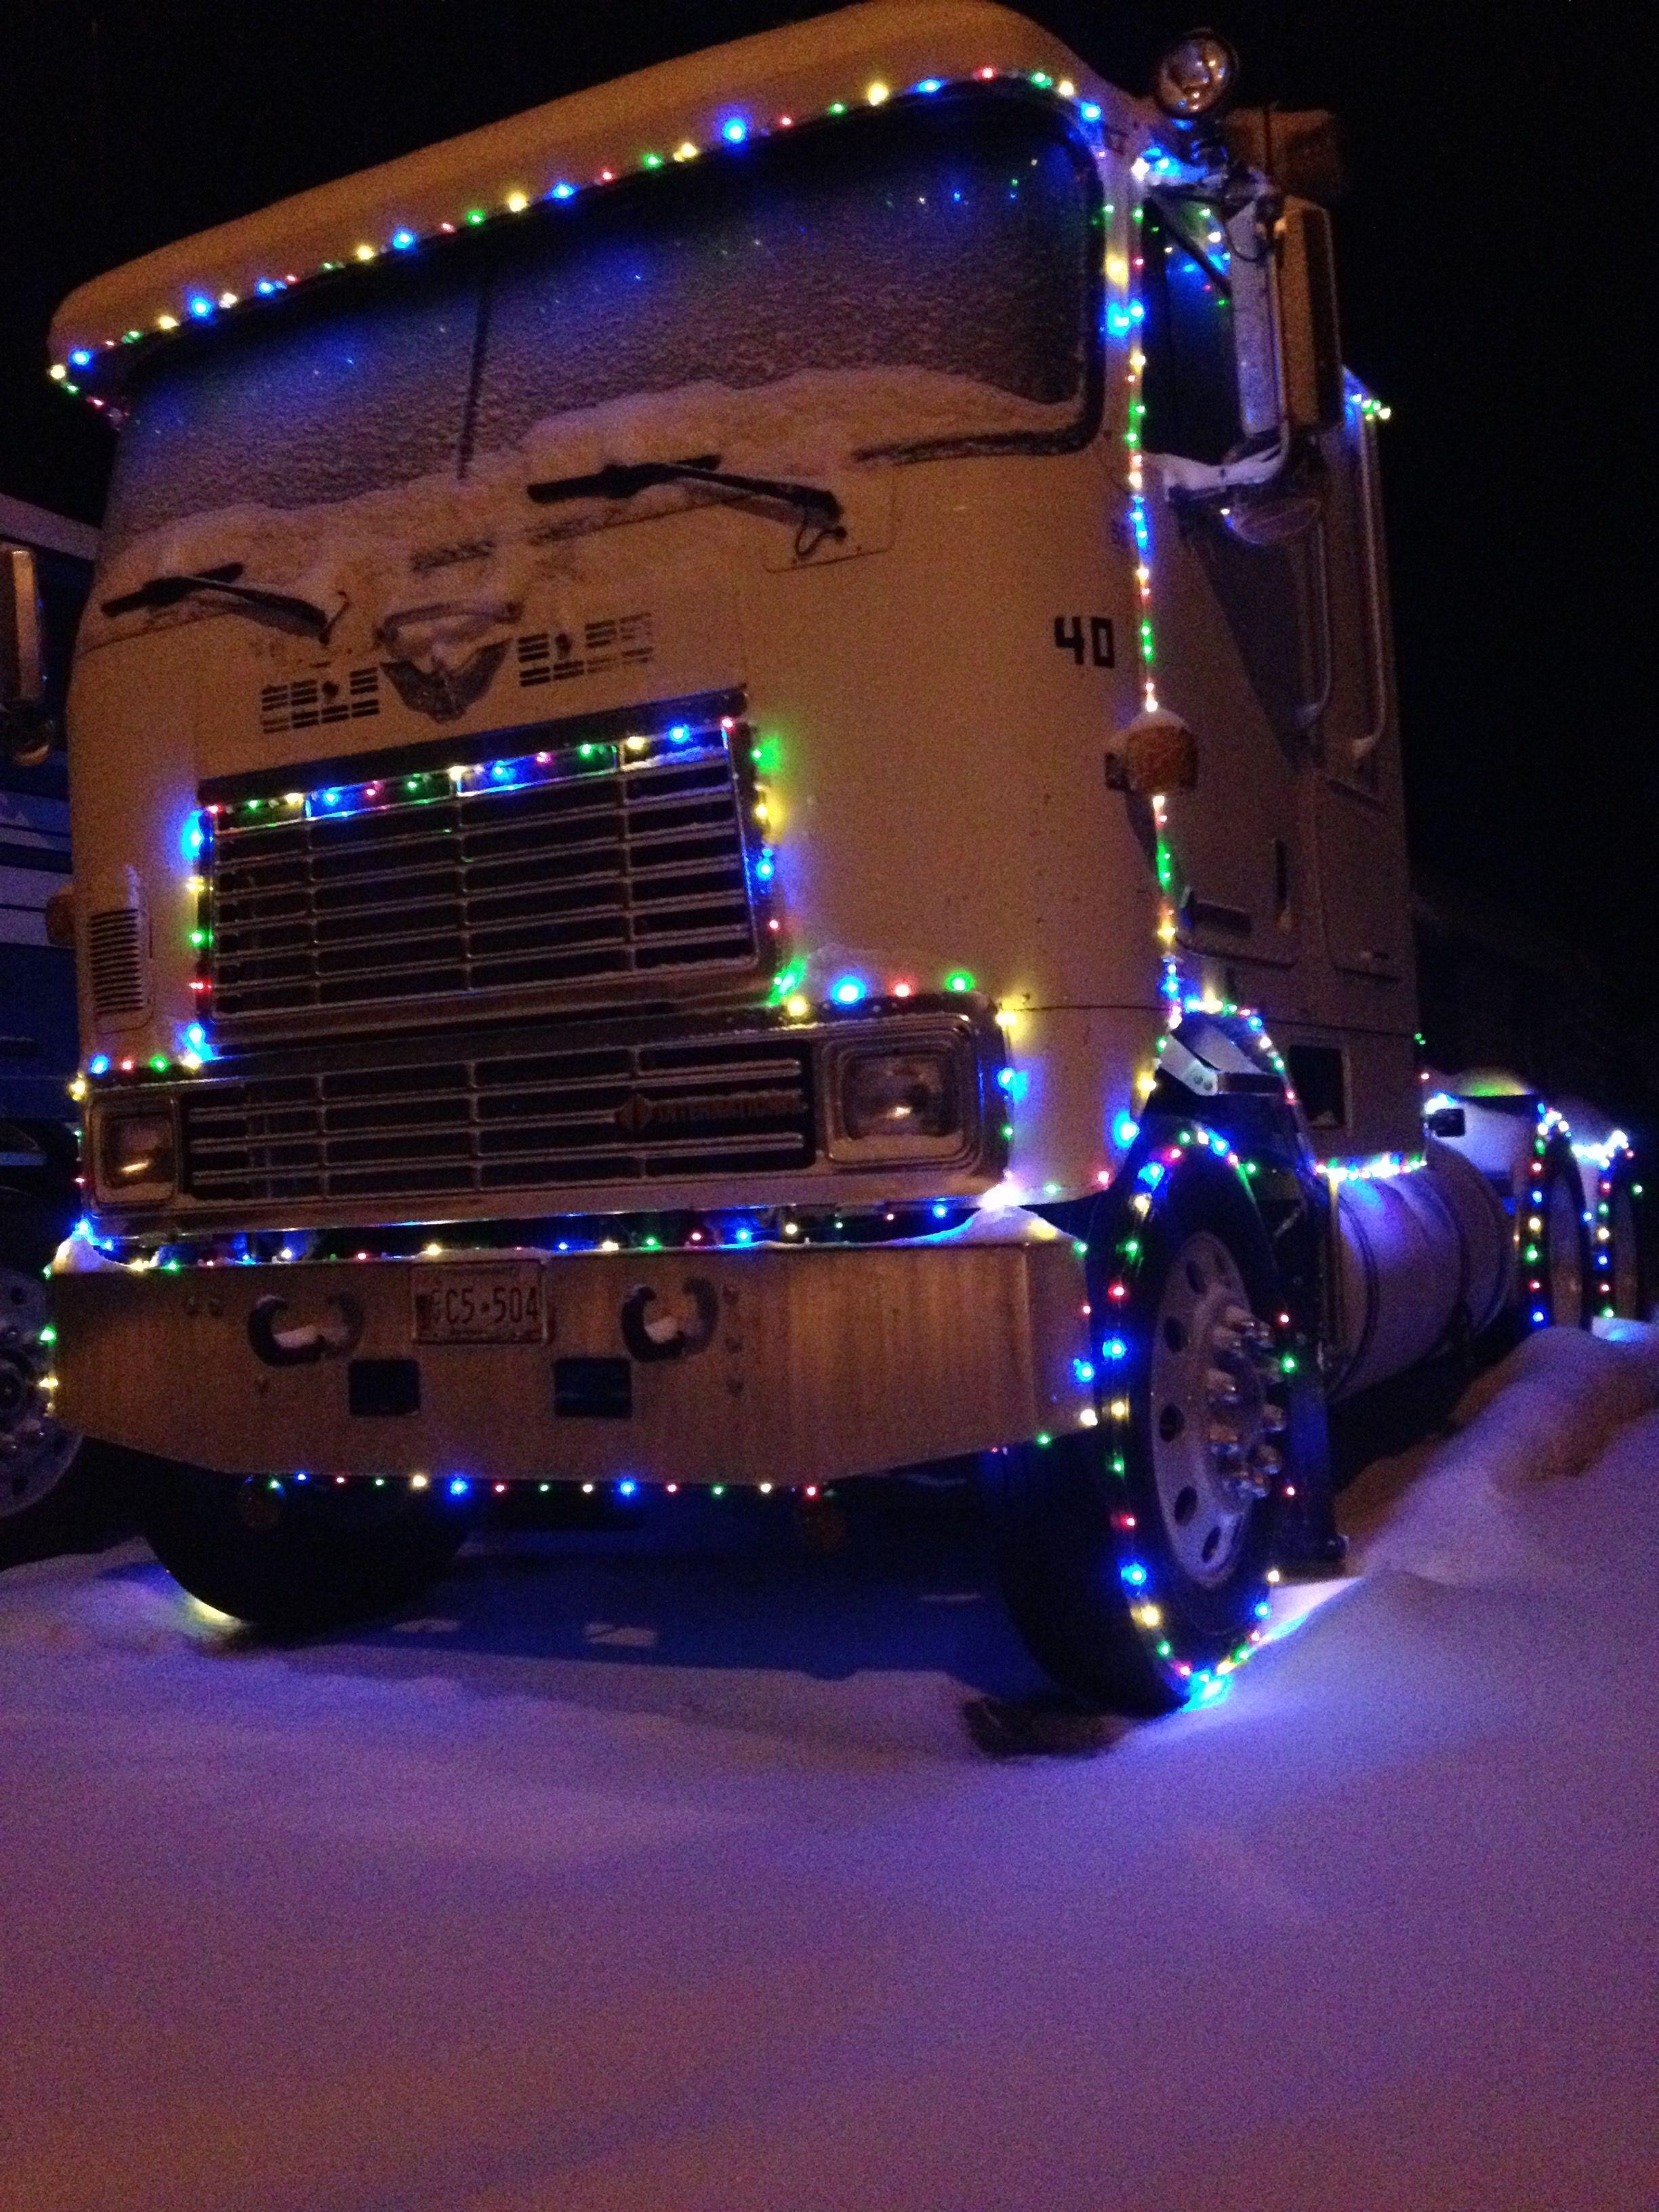 Christmas binder | Evans 9670 | Pinterest | Christmas and Binder